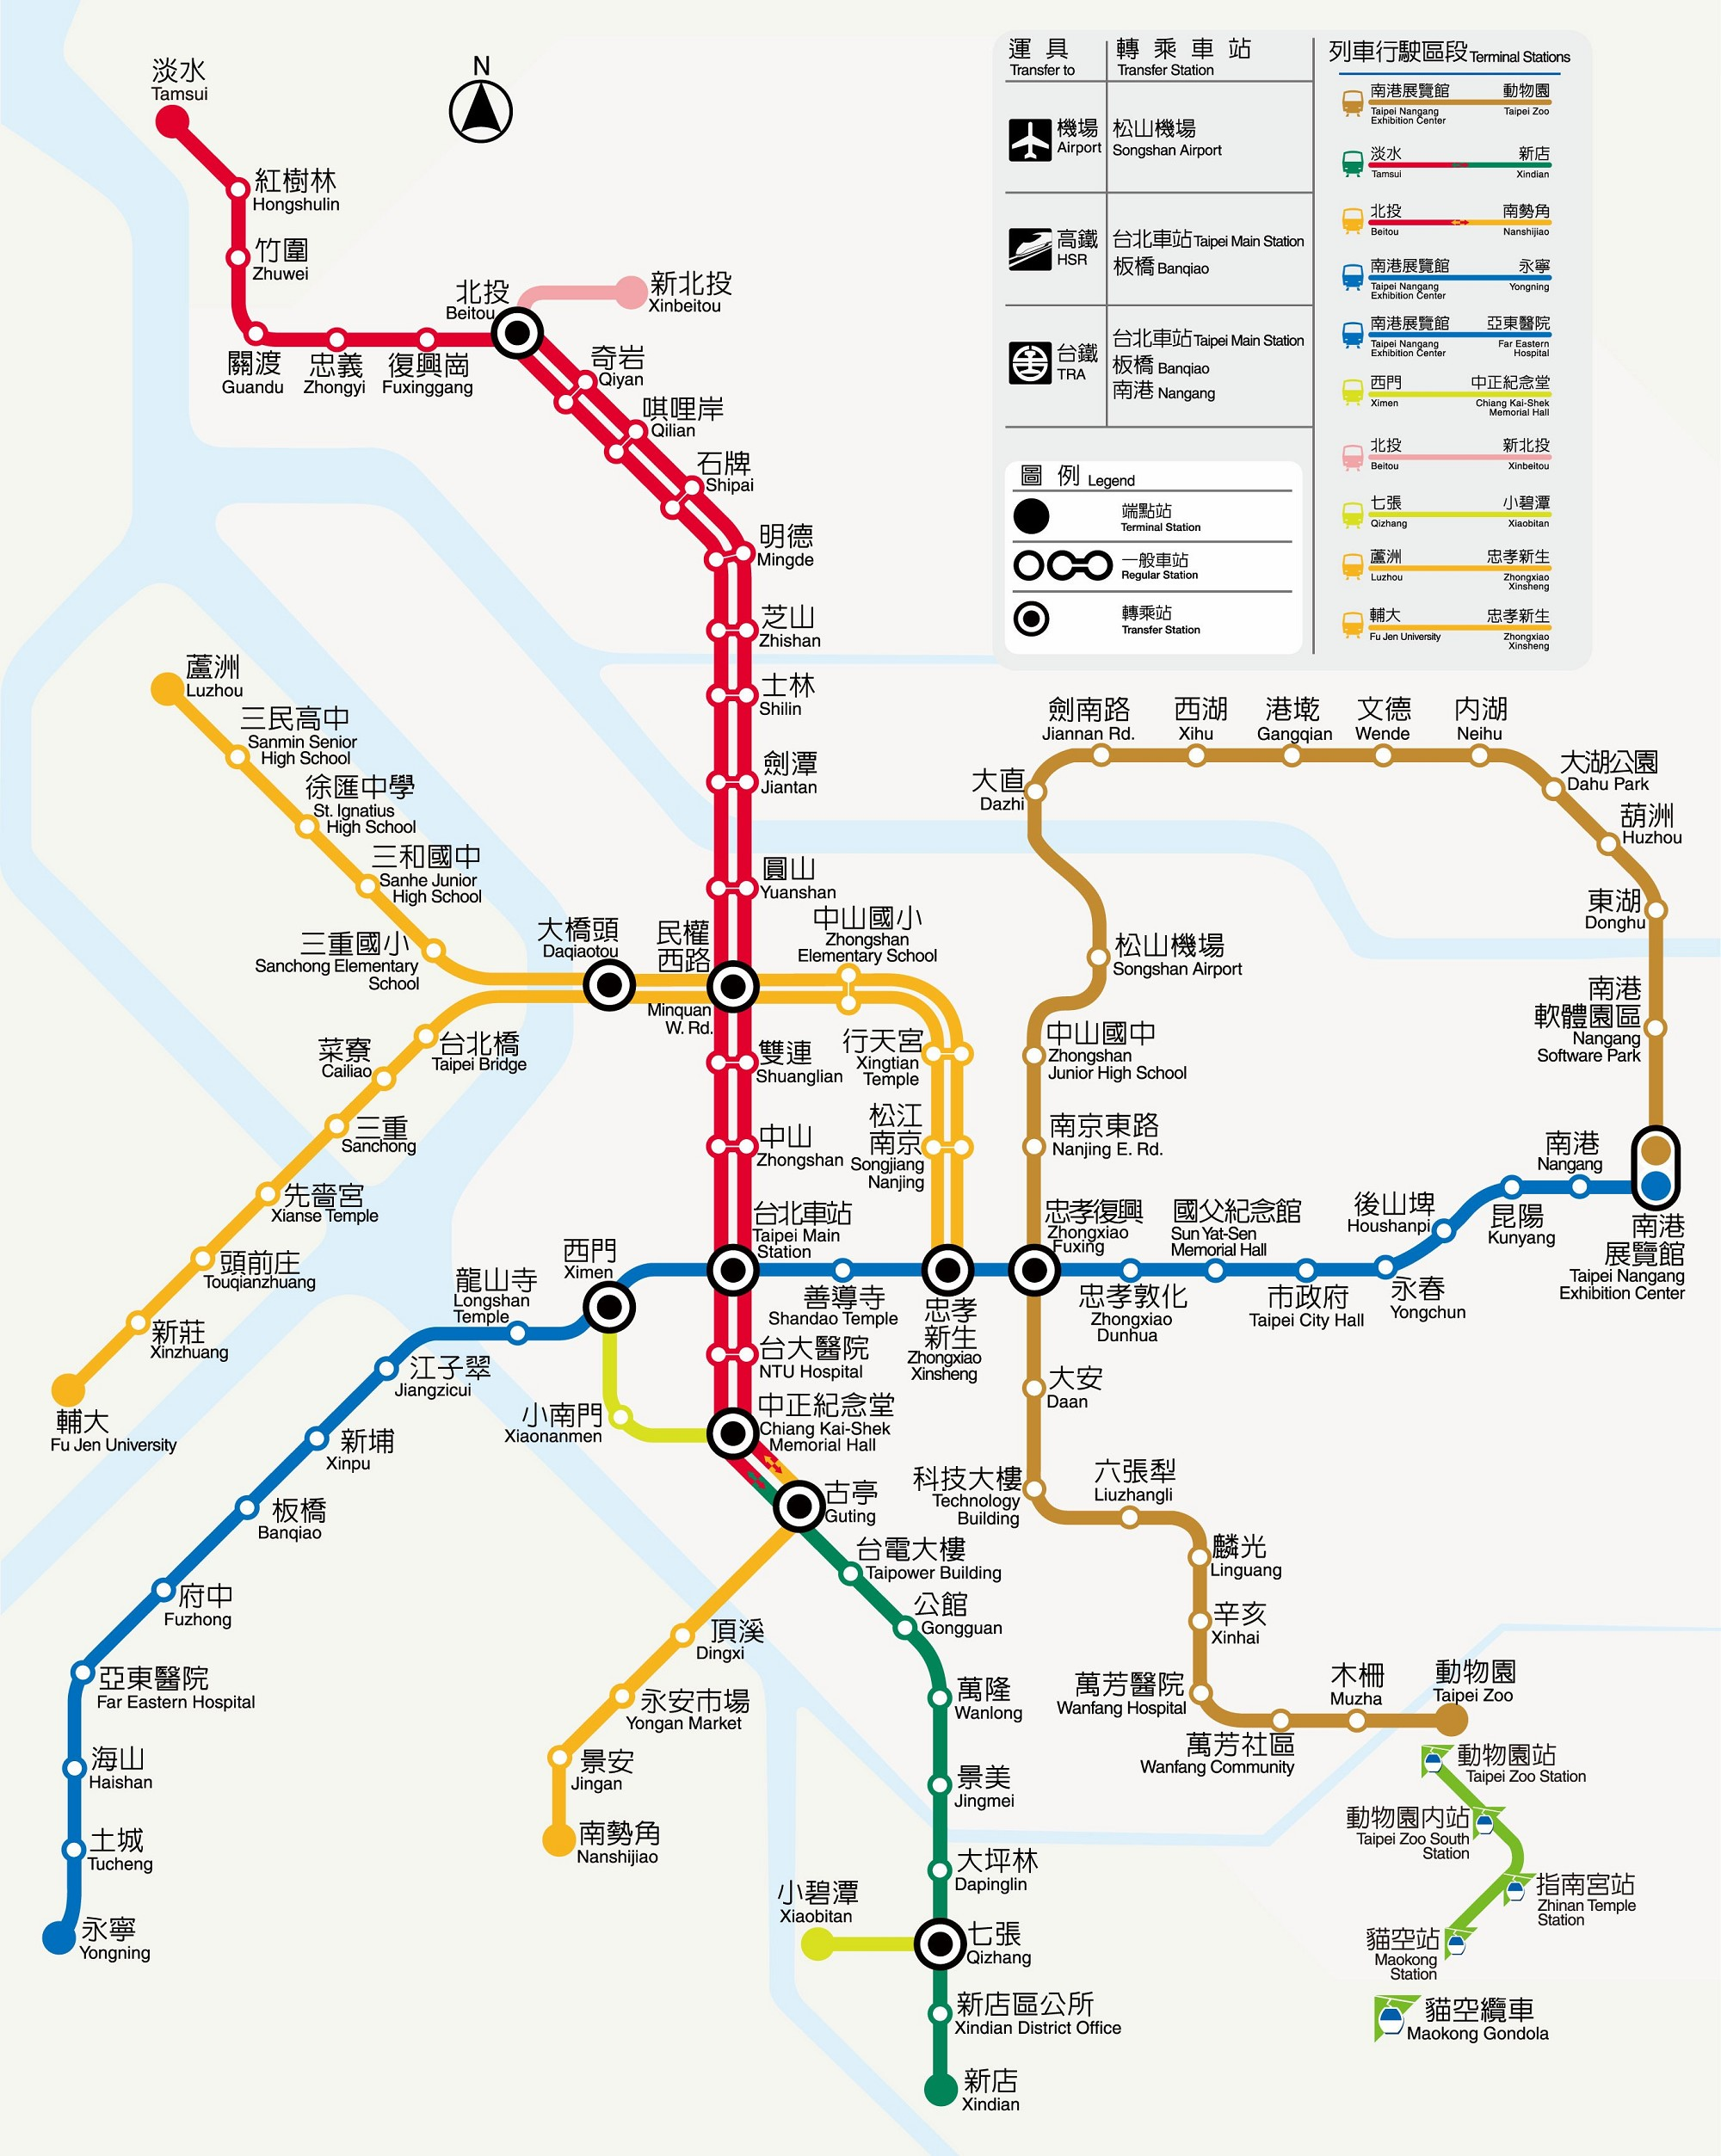 Subway Map Taipei.28 Reasons To Love Taipei Taiwan 28個愛上台北的理由 Tommy